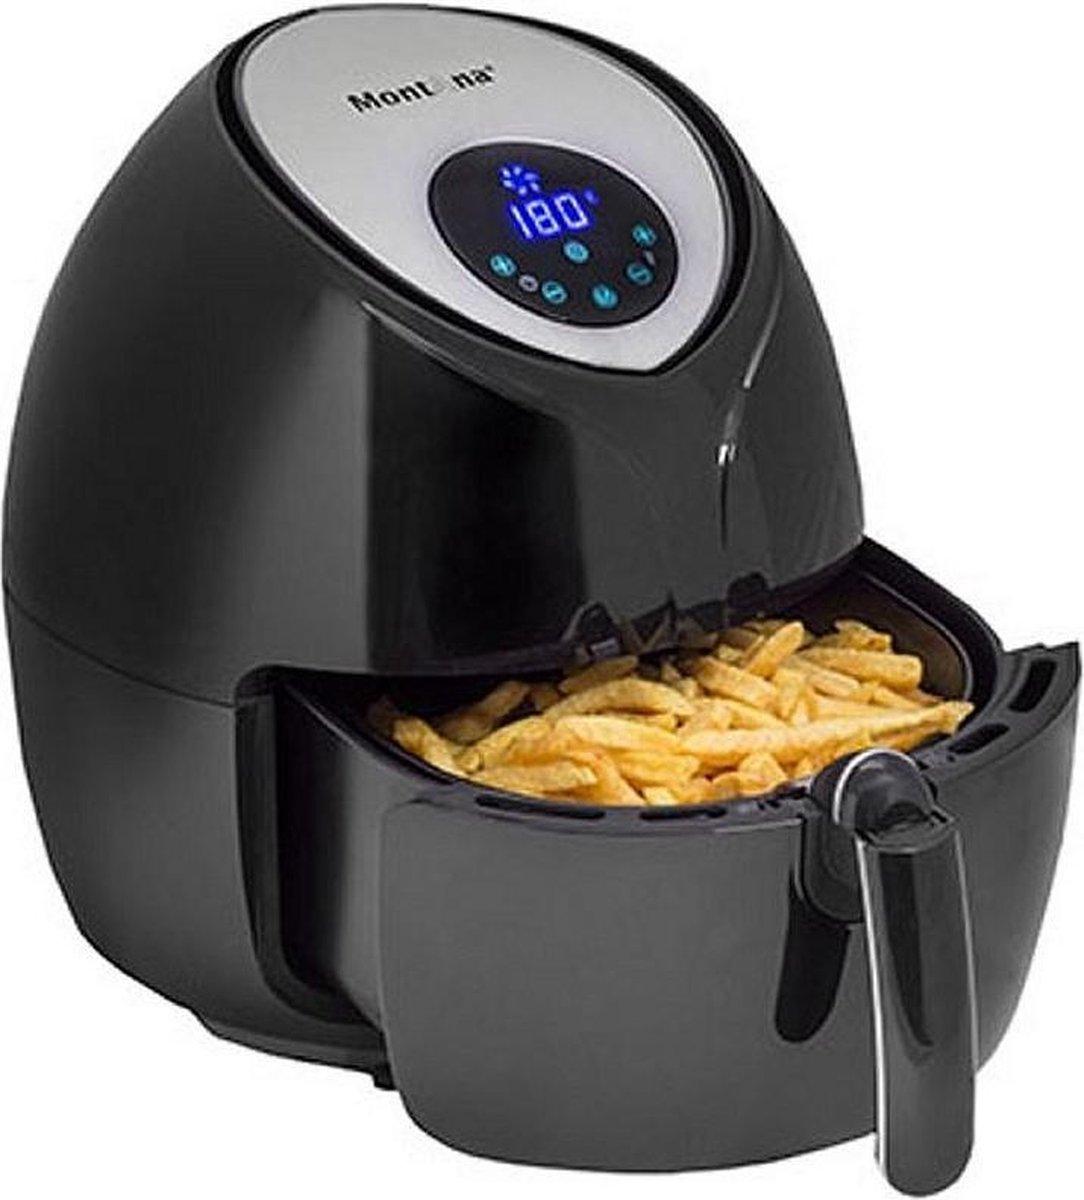 MONTANA MF 399XXL Master Fryer  - Airfryer  - Hetelucht friteuse